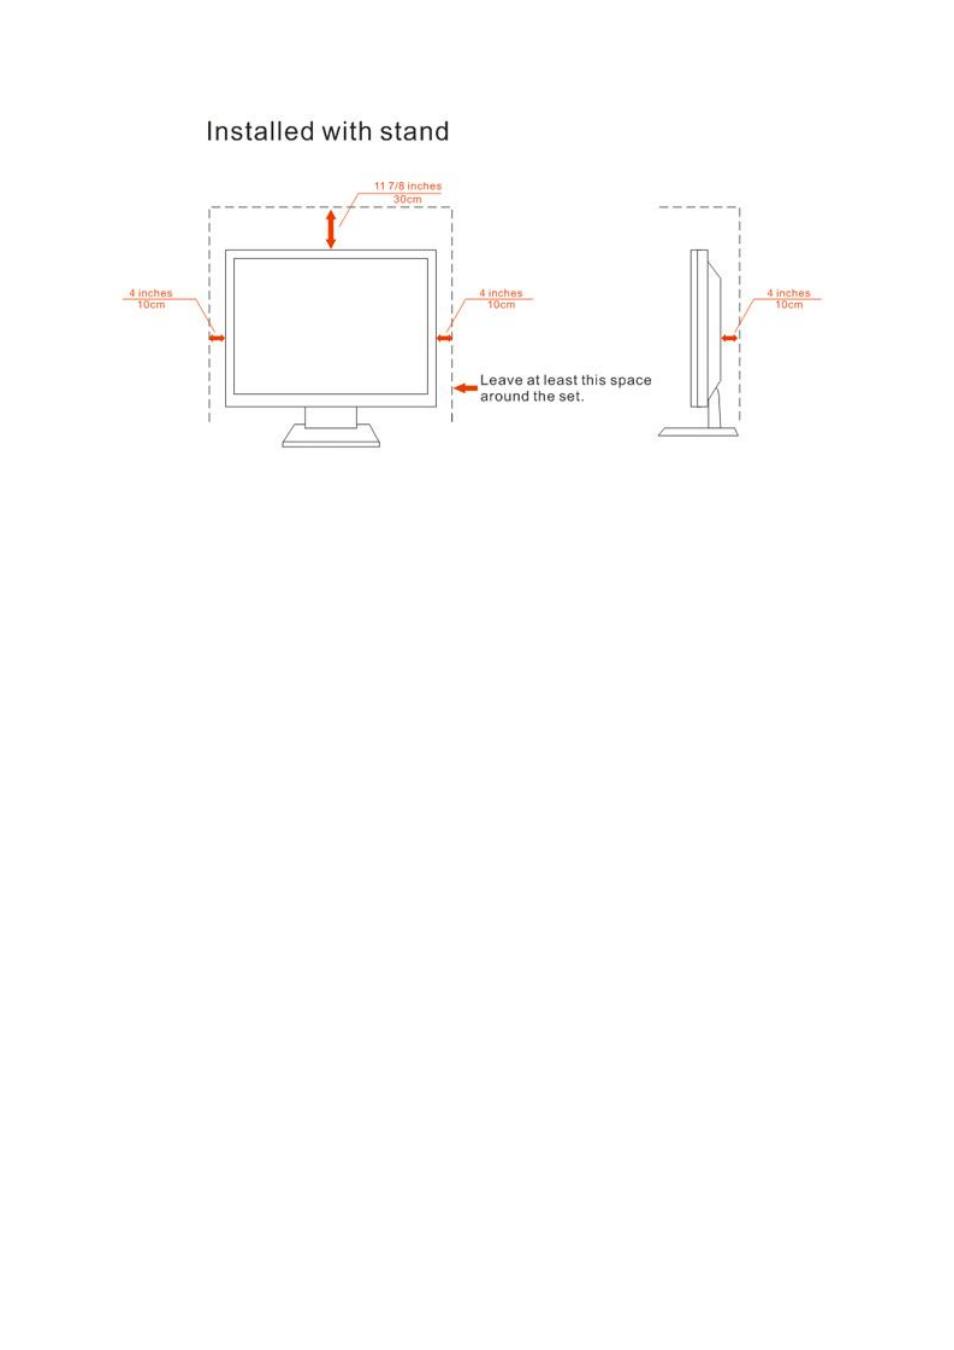 aoc 2436vh user manual page 7 61 rh manualsdir com Owner's Manual Instruction Manual Example